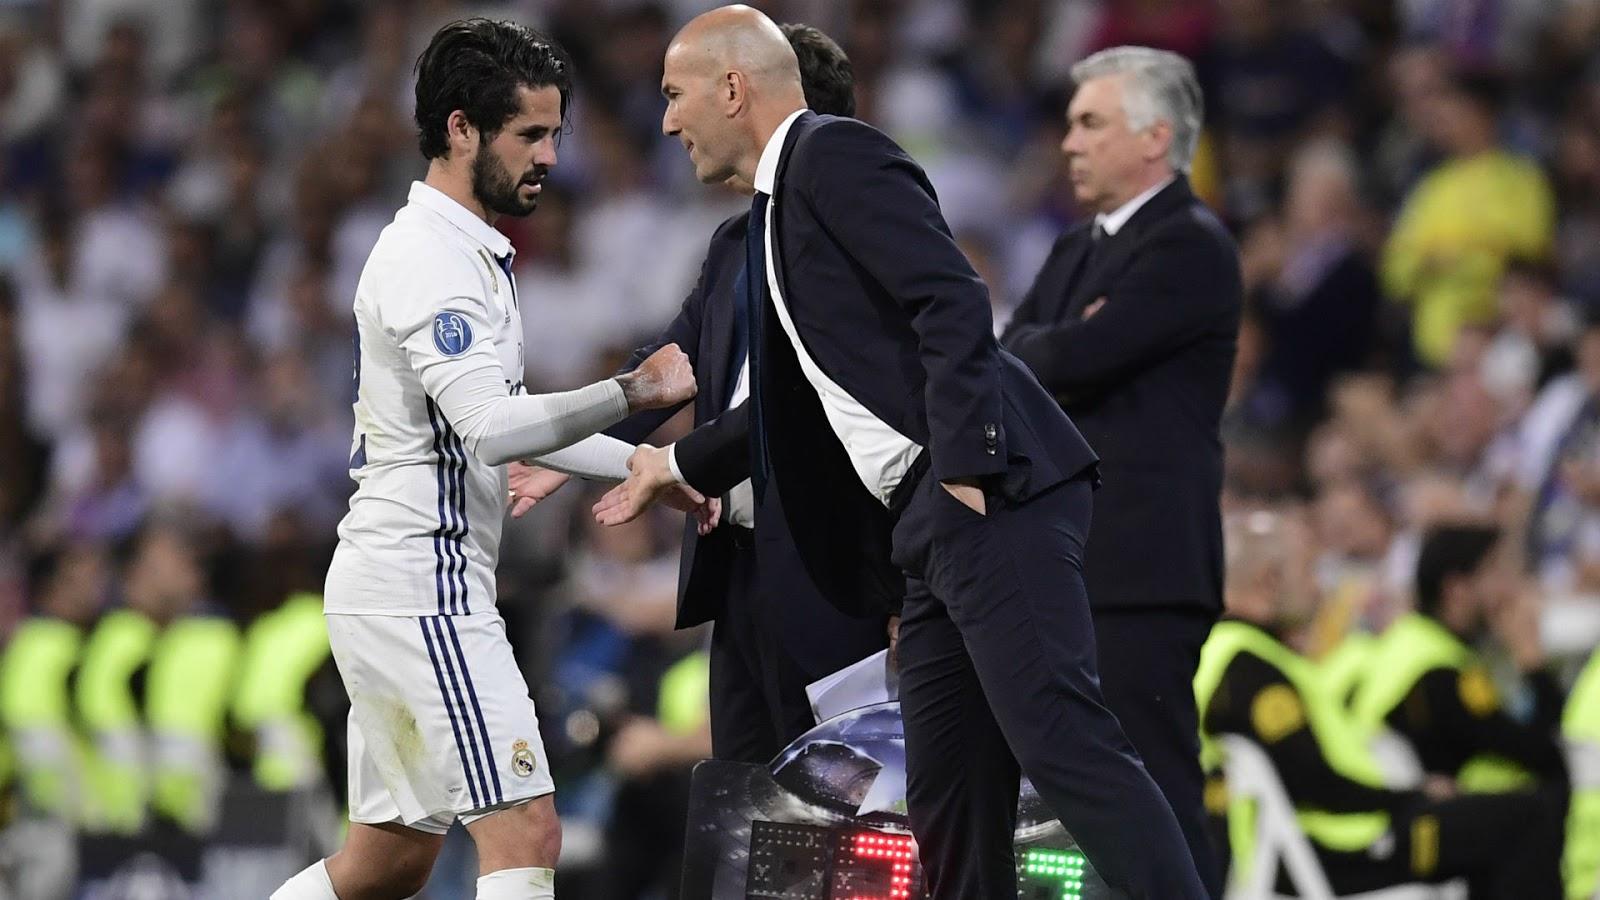 tai-sao-Isco-dang-phai-vat-lon-voi-Real-Madrid-2